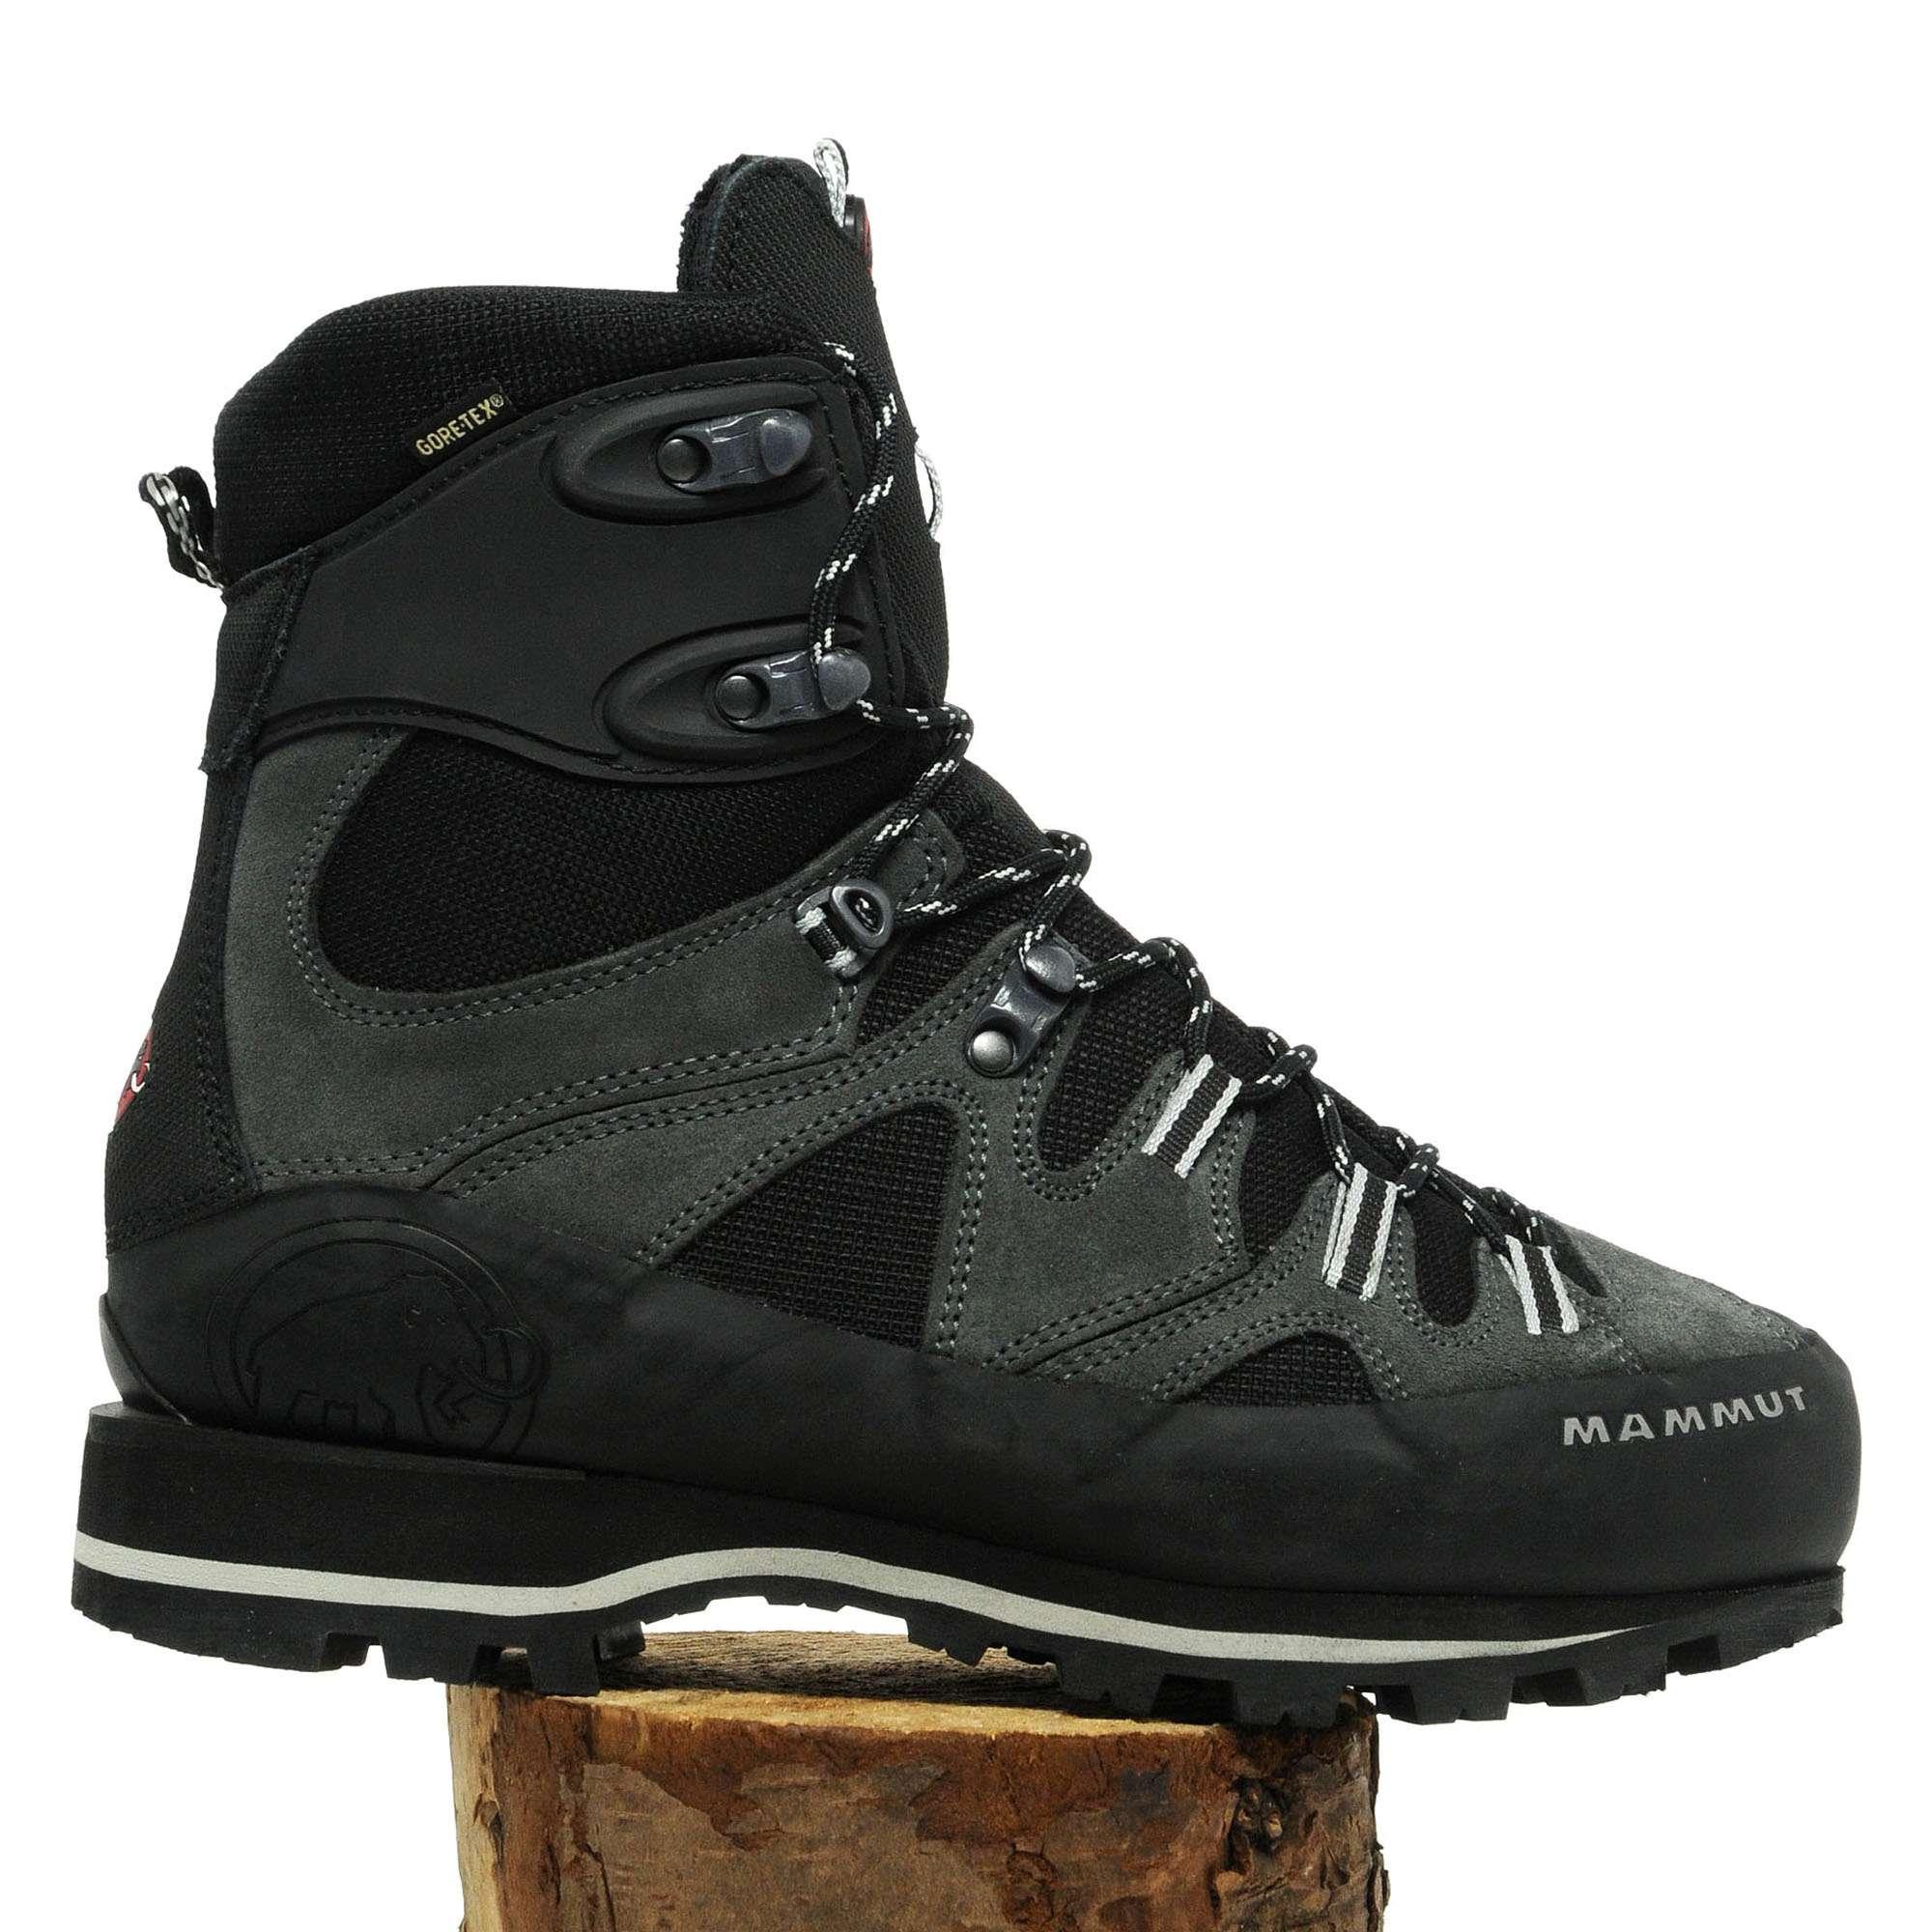 MAMMUT Men's Monolith GORE-TEX® Boot